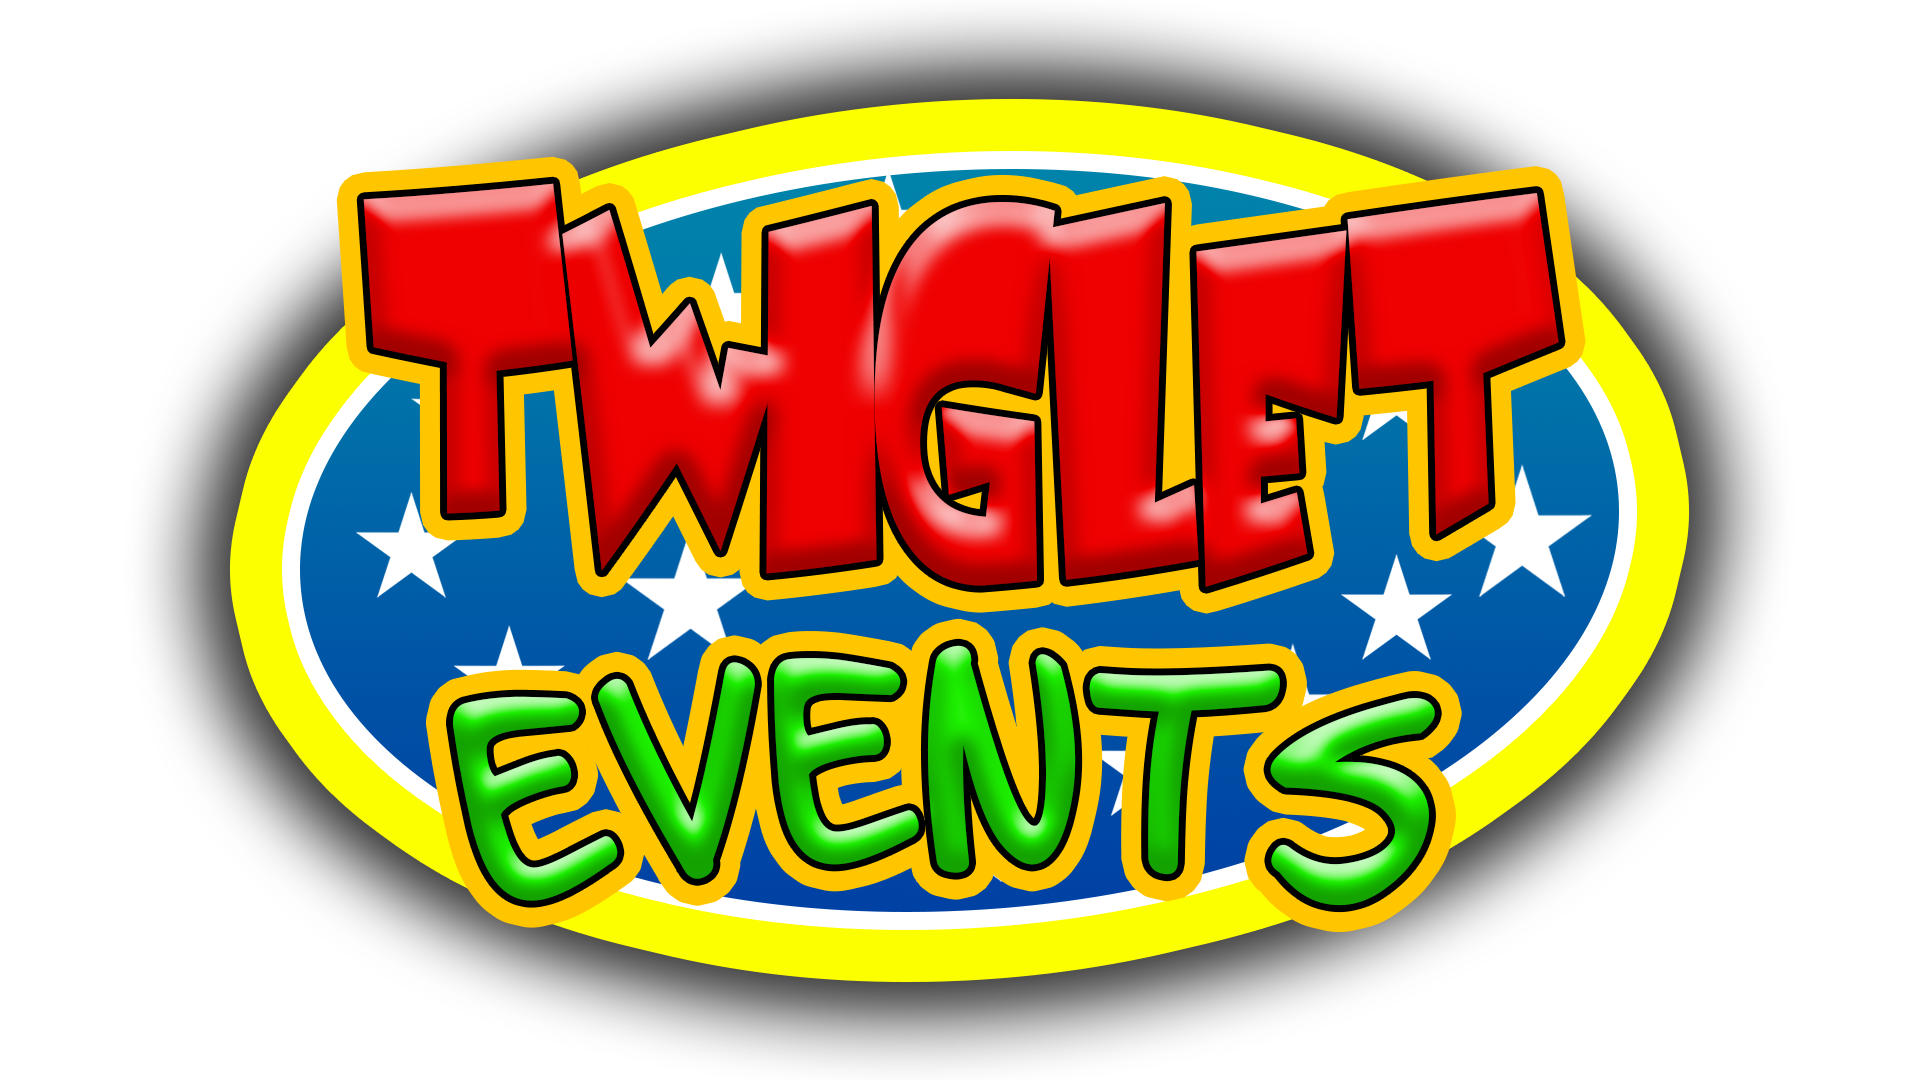 Twiglet Events Logo